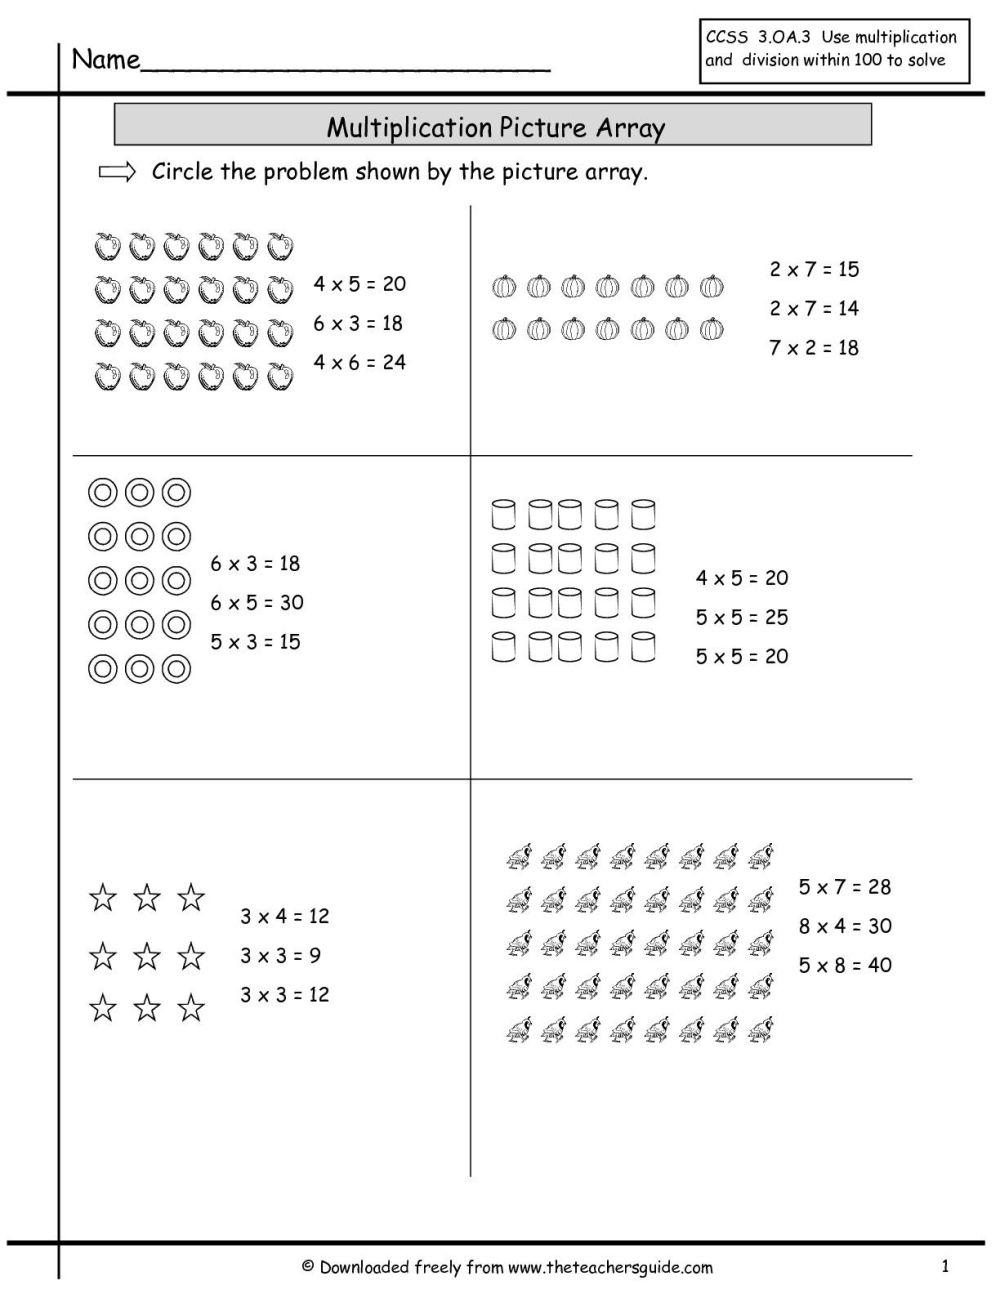 medium resolution of 16 Best Array Worksheets images on Best Worksheets Collection